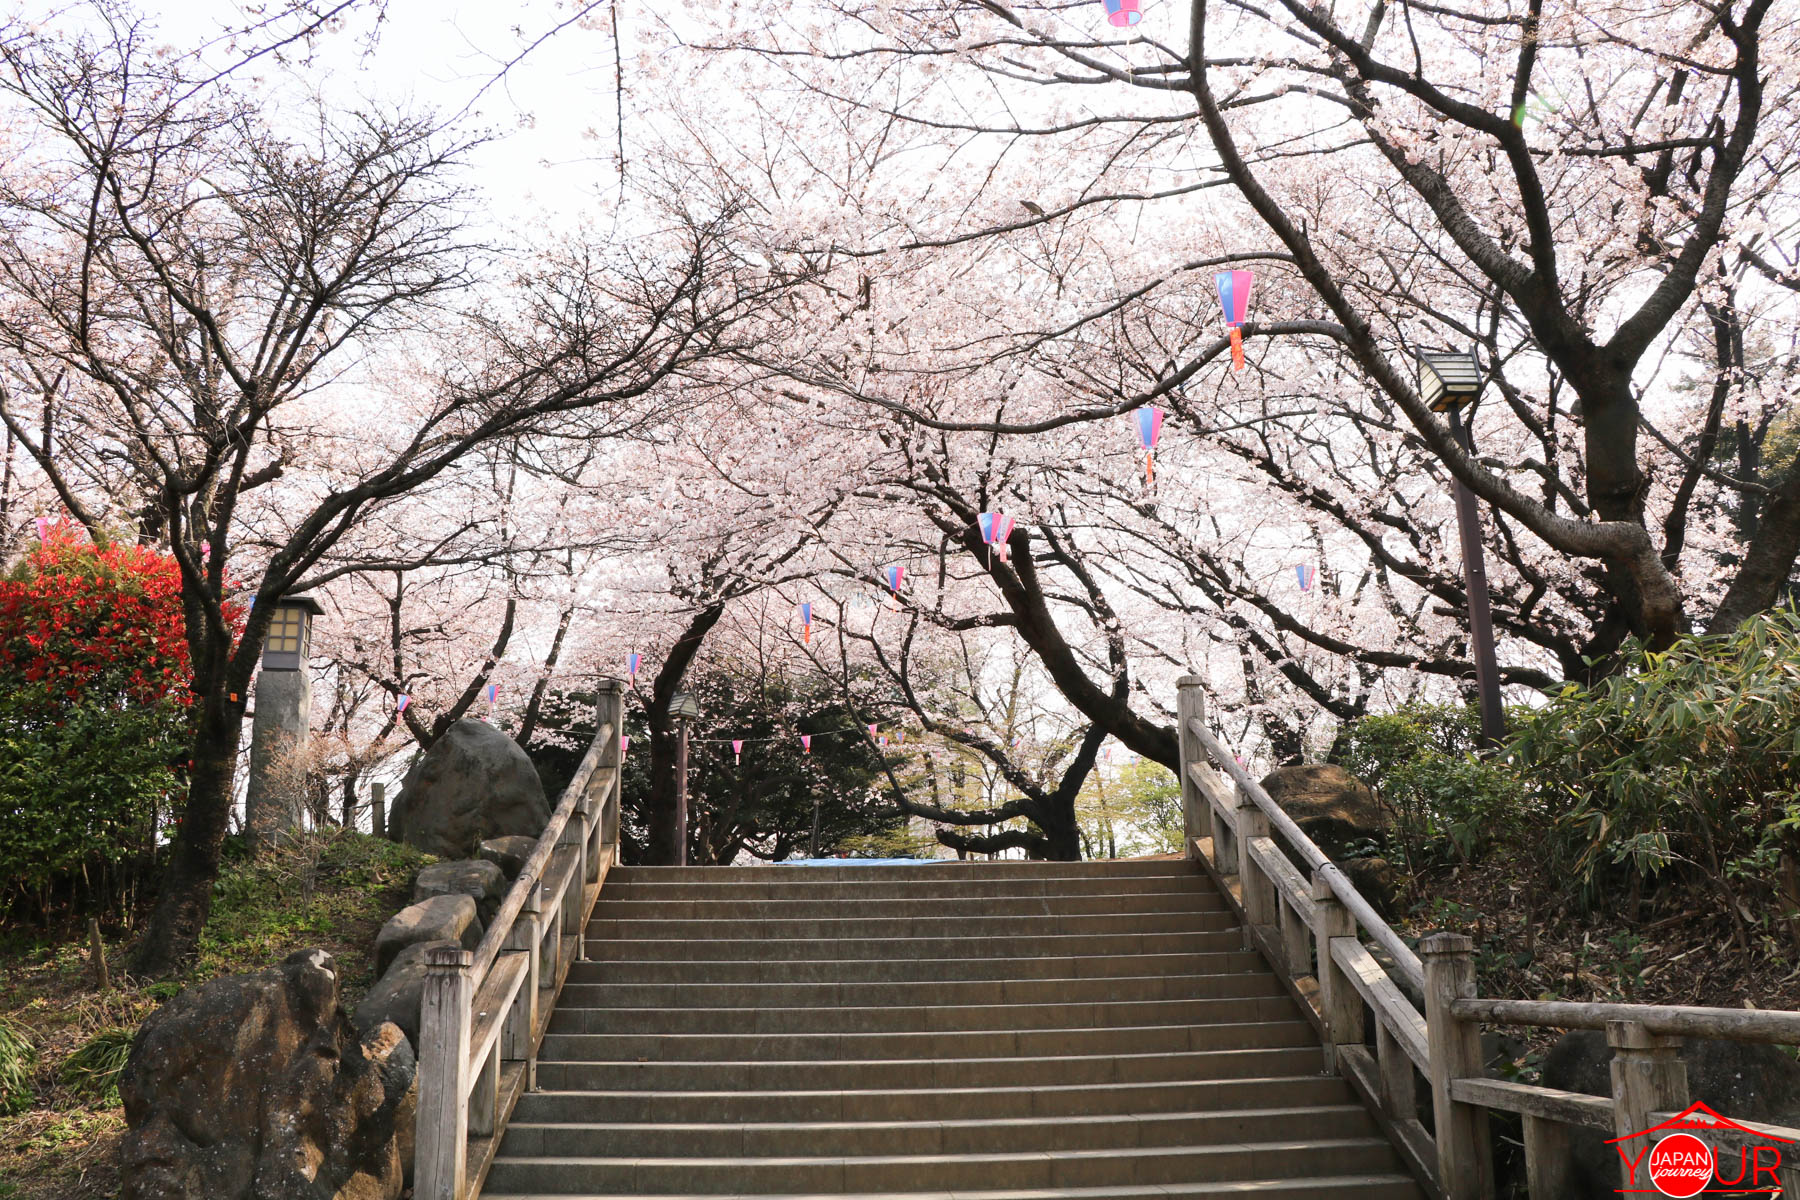 Japan Cherry Blossom Forecast 2019 - Asukayama Park